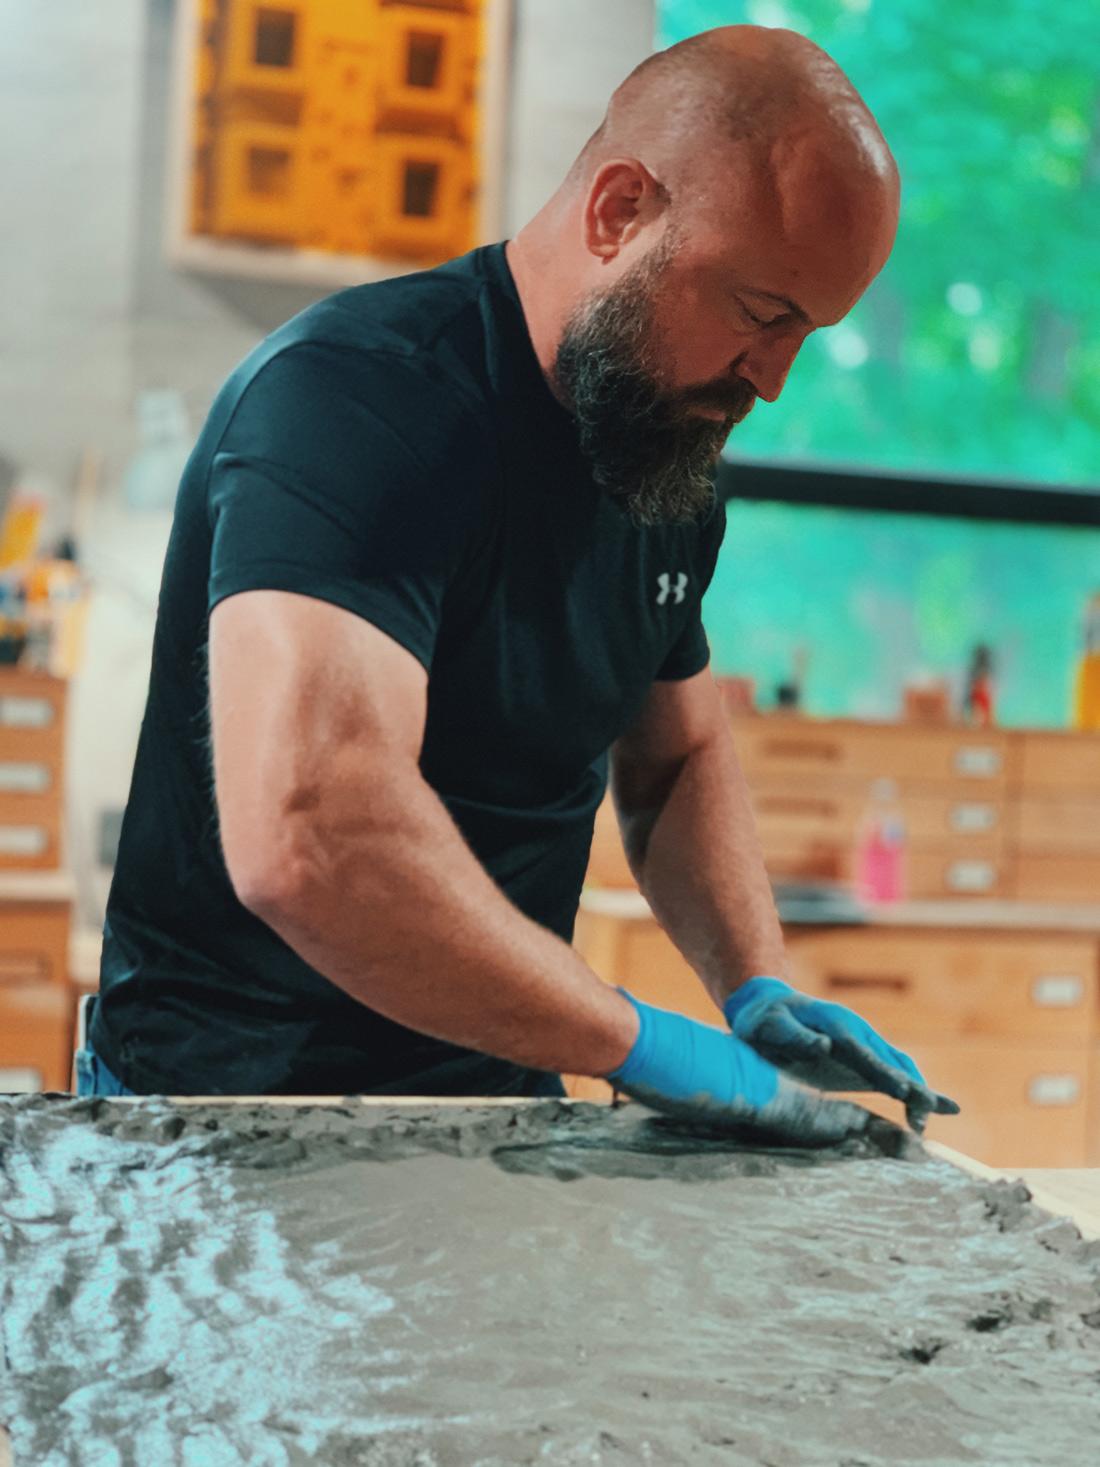 Jon-Schuler-Cast-In-Place-Concrete-Countertop-Training-Class-Workshop-6.jpg